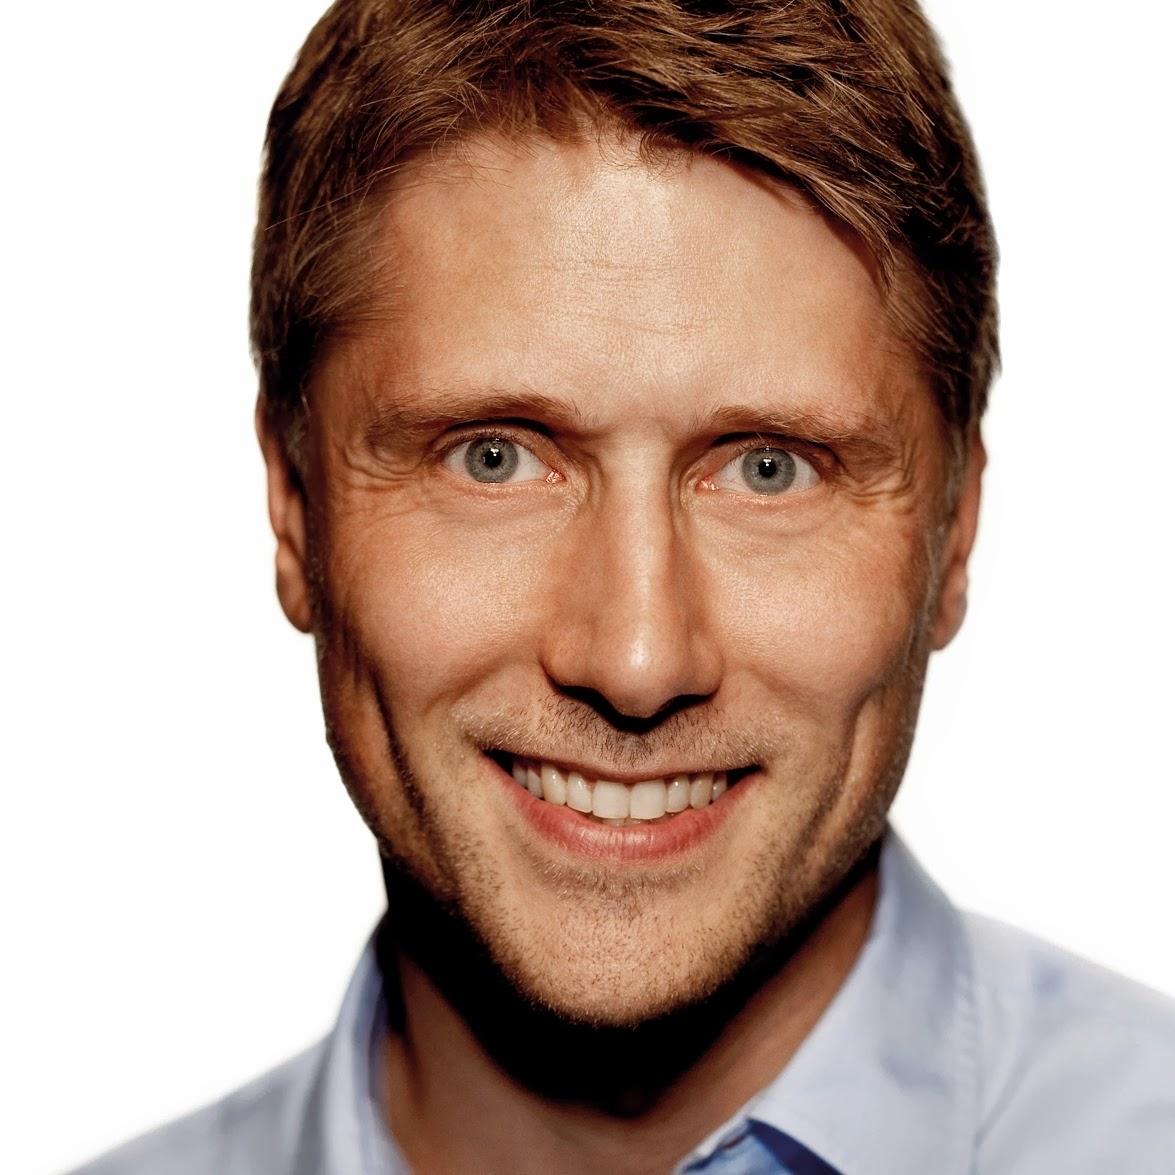 Byrådsmedlem Thomas Horn